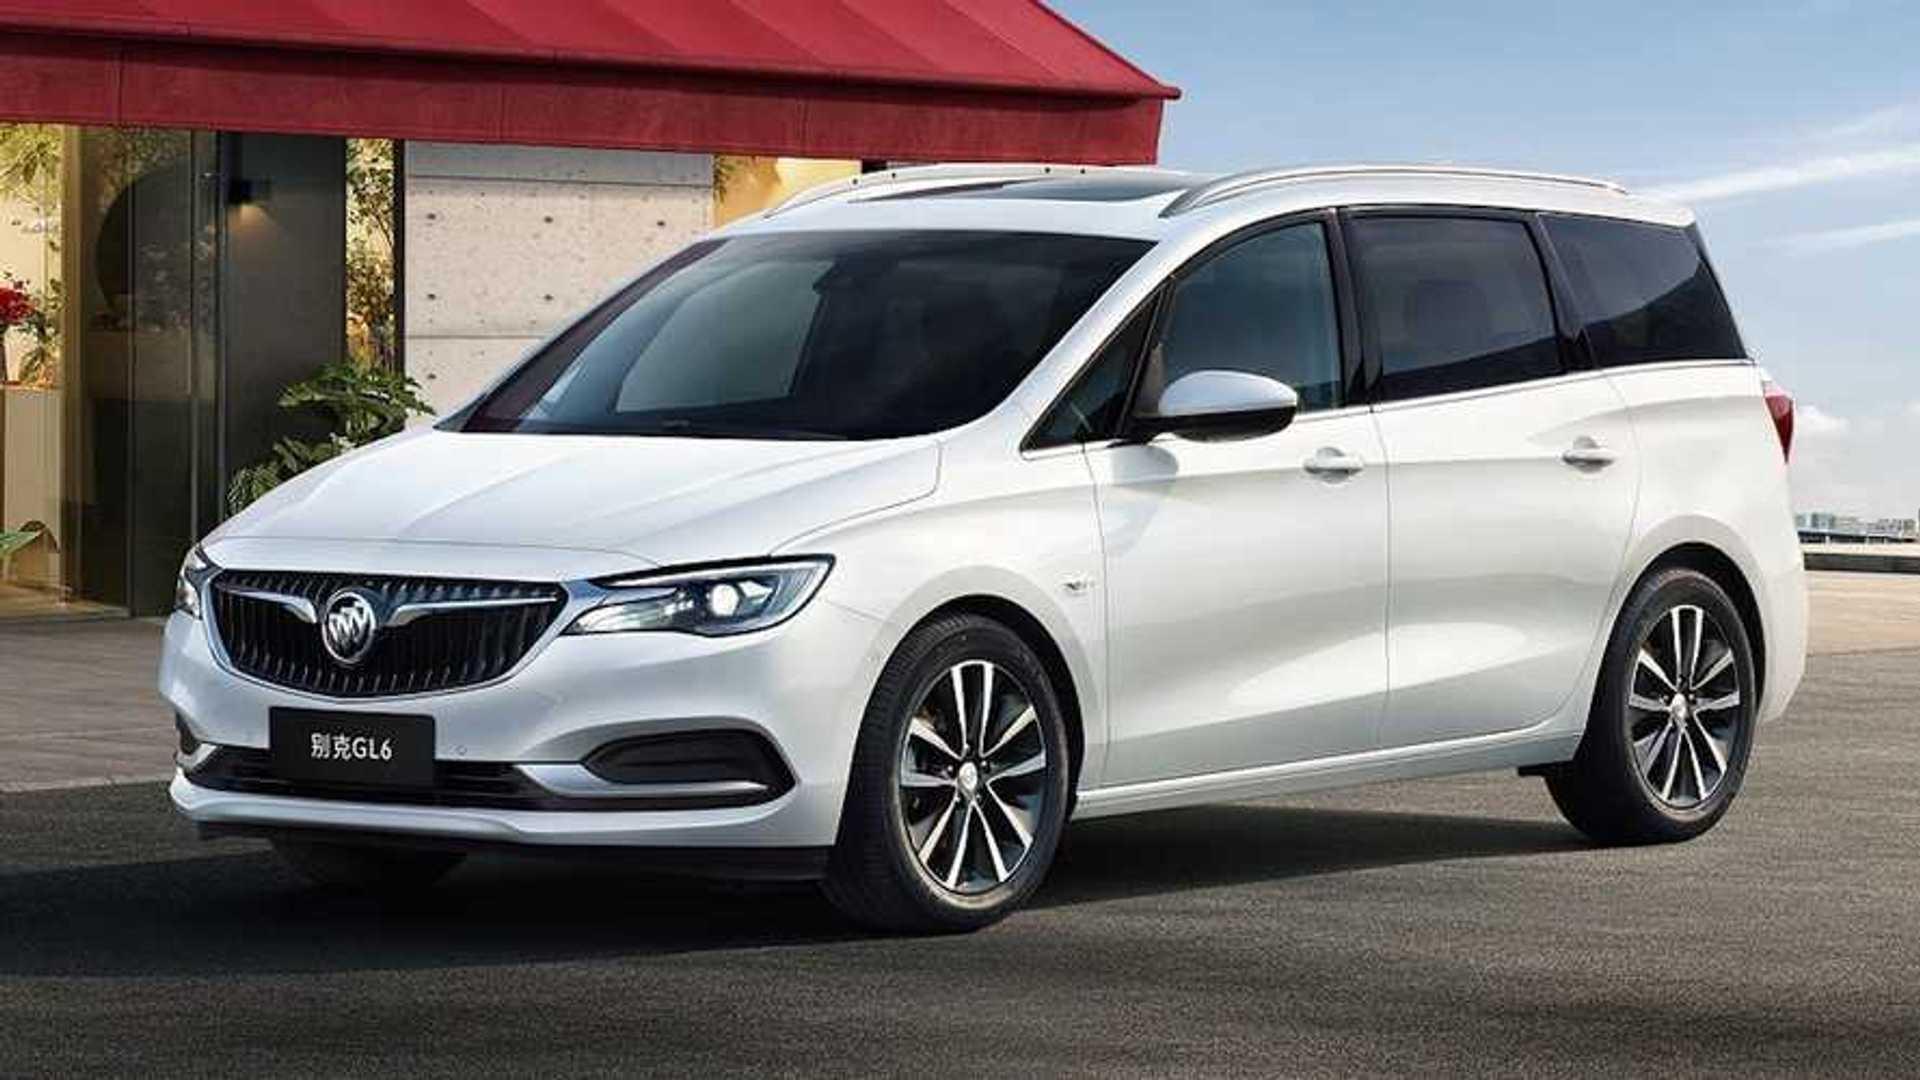 2021 Buick GL6 Mild Hybrid Set To Fortify Brand's MPV ...